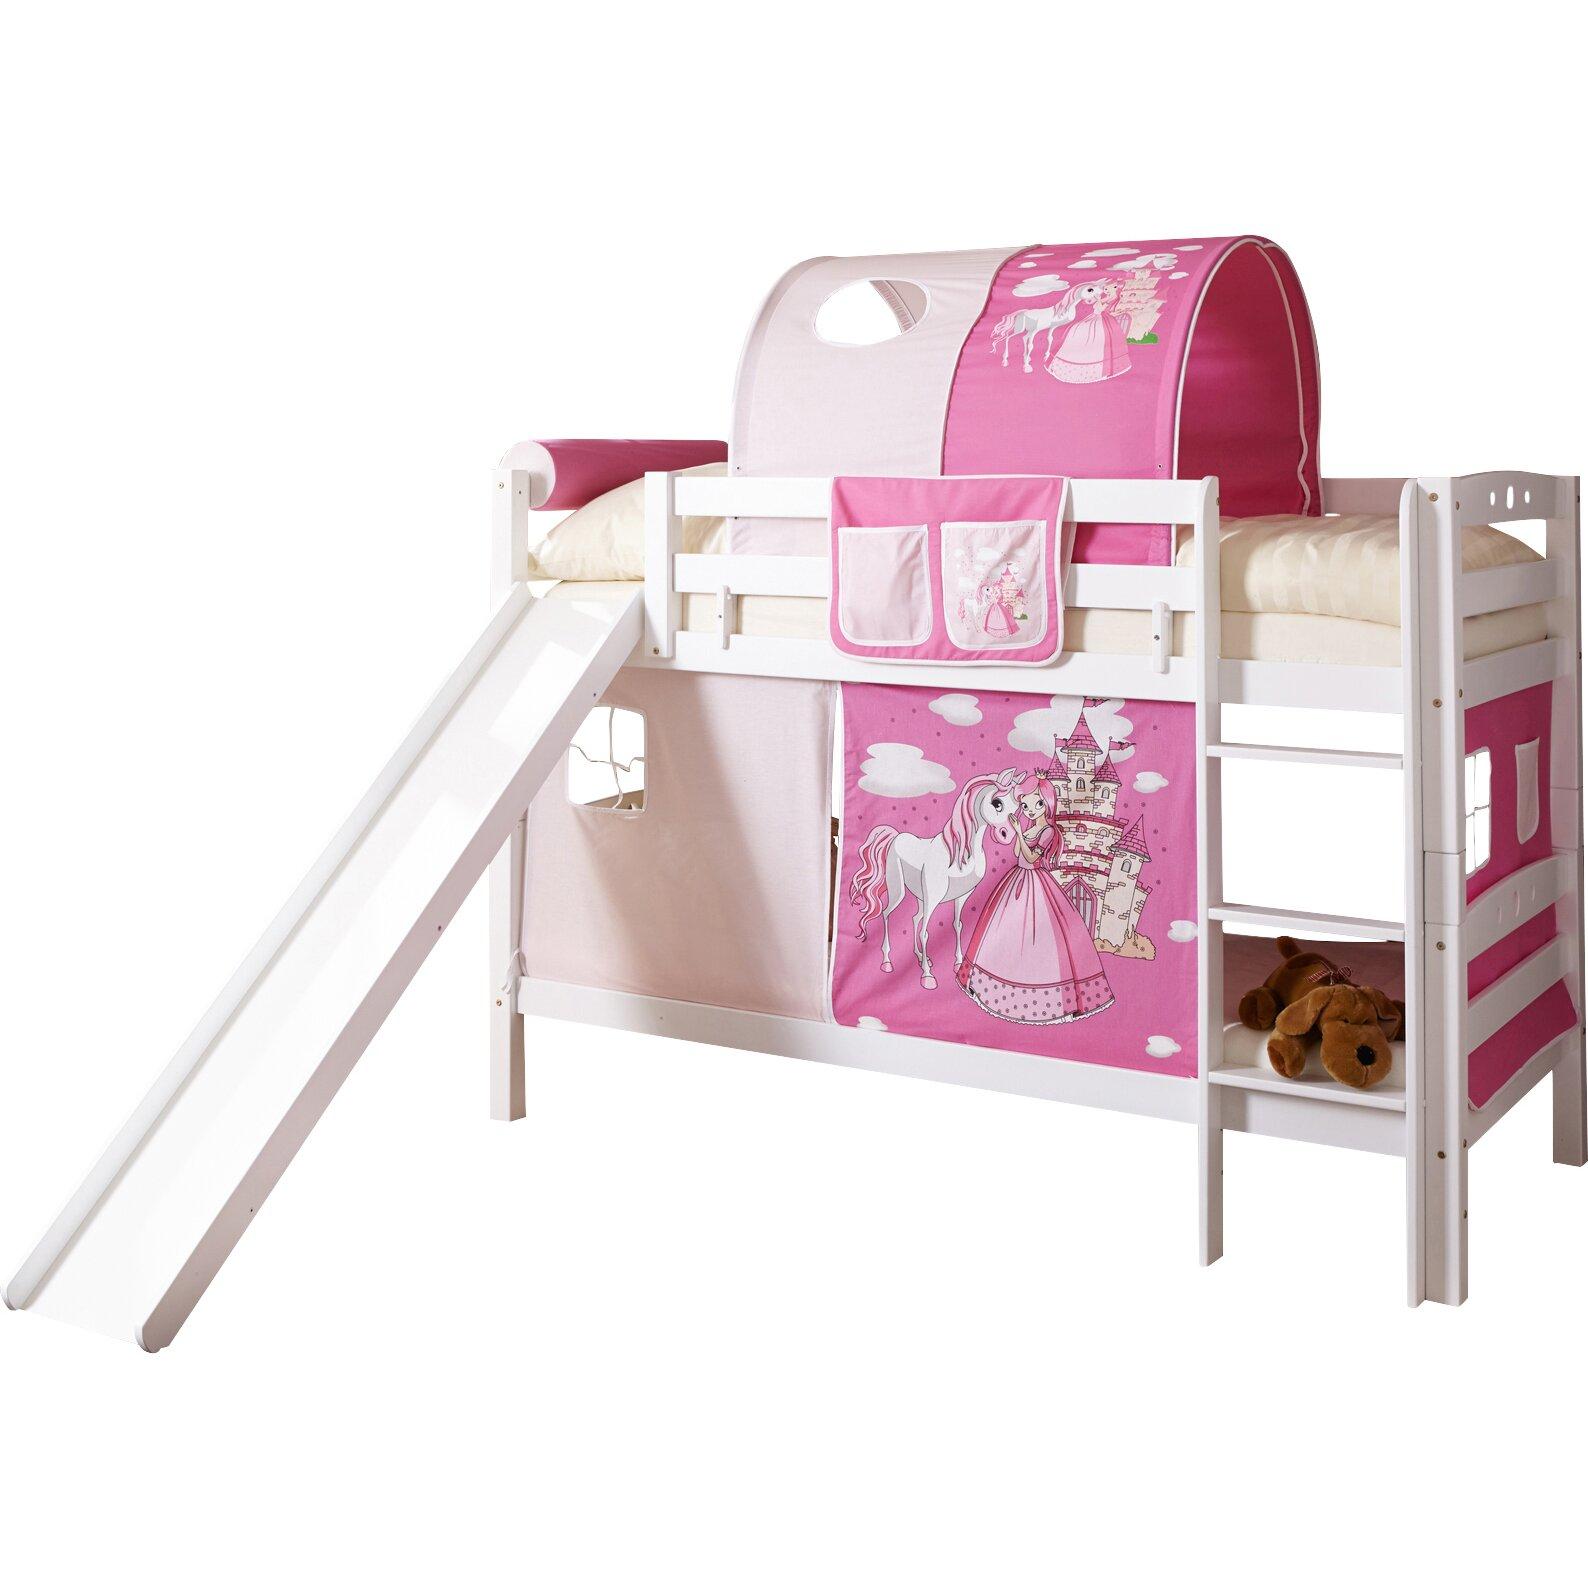 ticaa etagenbett lupo mit rutsche 90 x 200 cm reviews. Black Bedroom Furniture Sets. Home Design Ideas